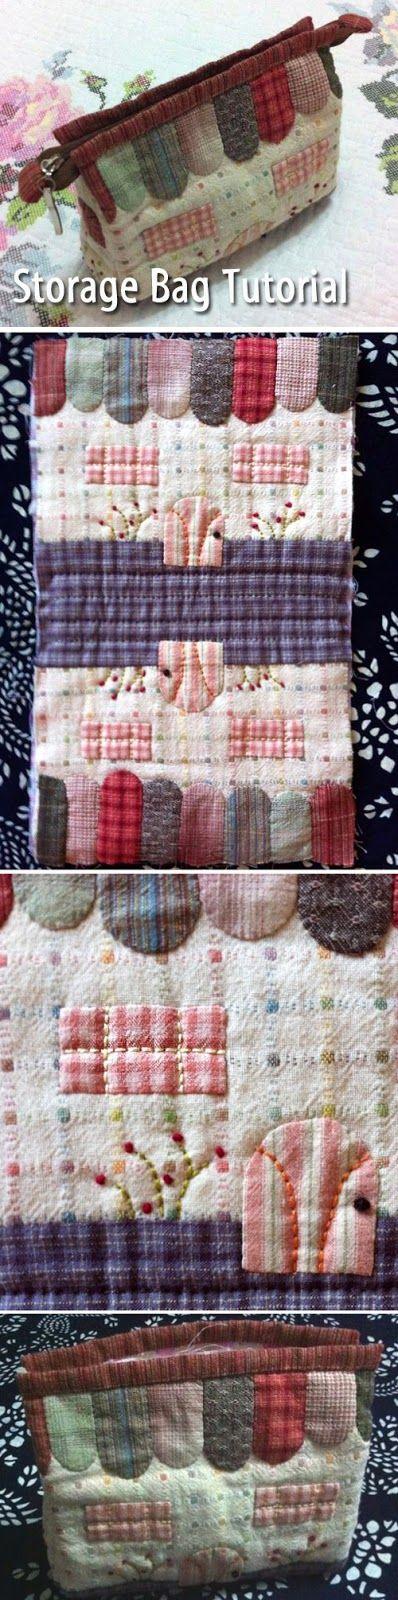 Necessaire -   http://www.handmadiya.com/2015/08/storage-bag-little-house-patchwork.html